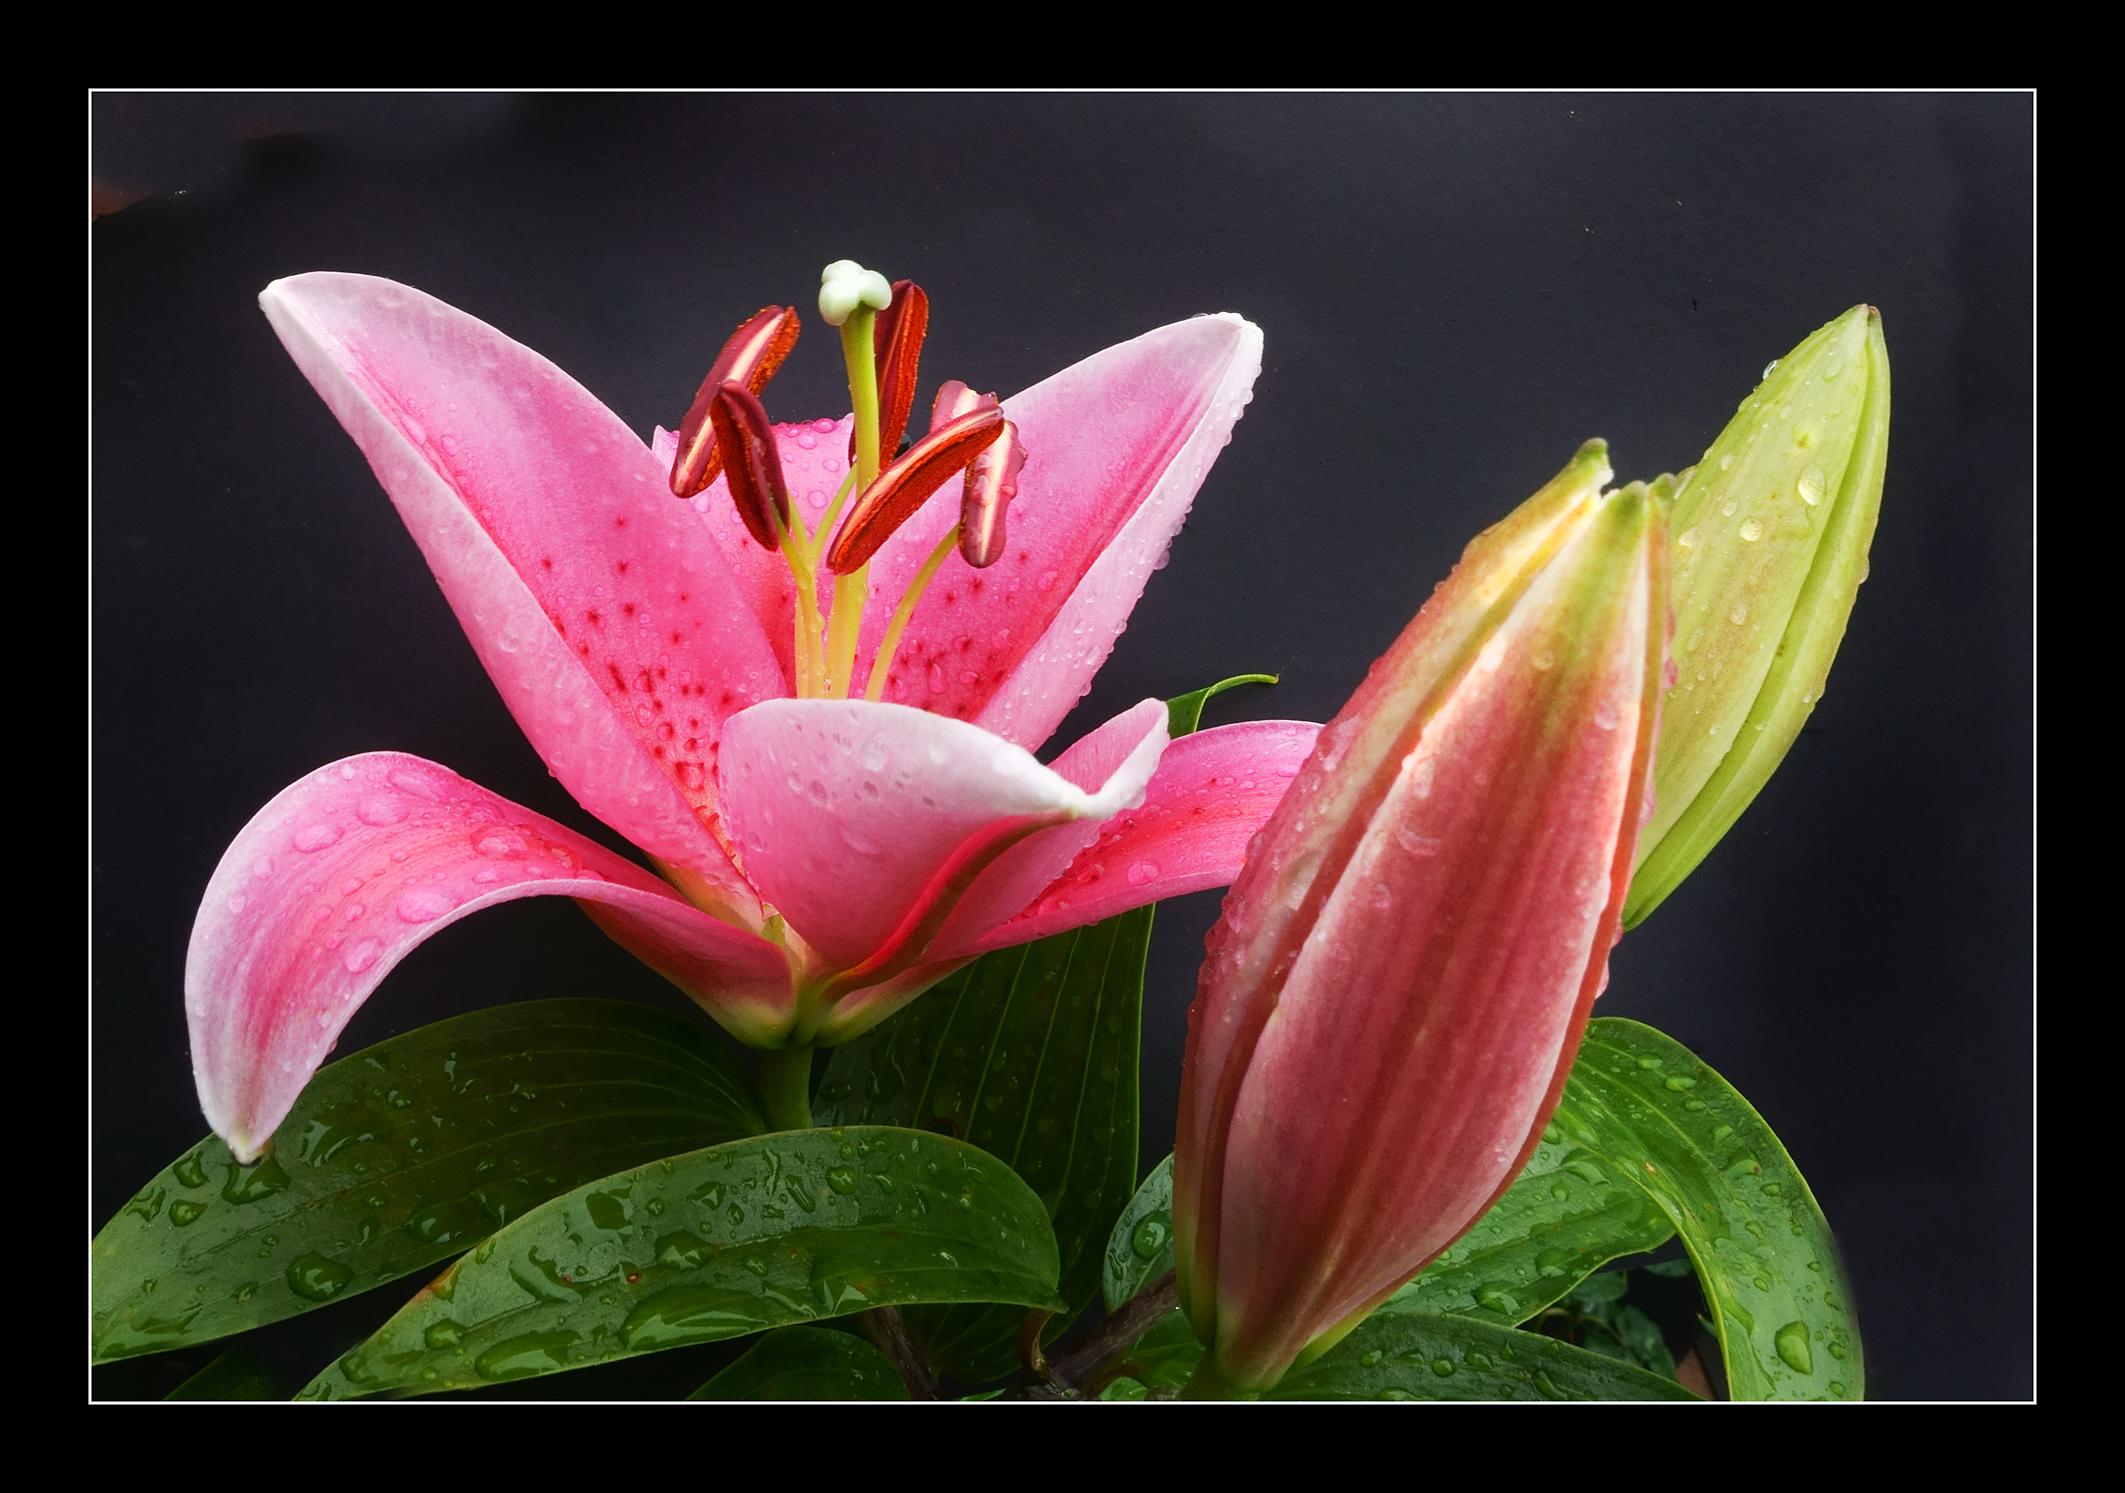 Free Images : open, flower, purple, petal, bloom, dark, green, color ...